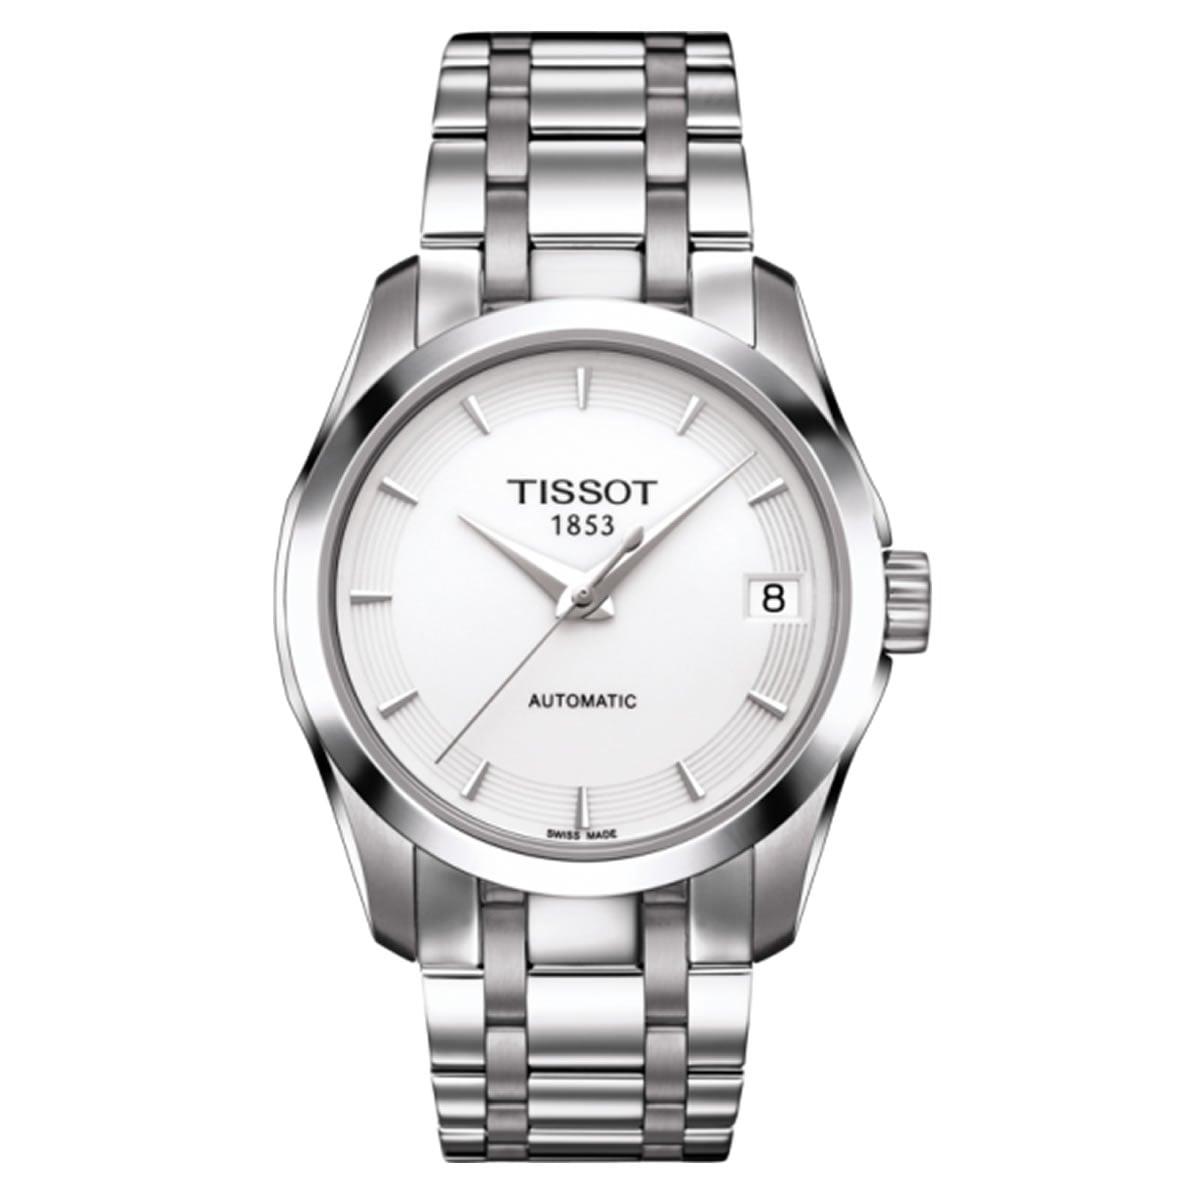 Tissot(ティソ) Couturier(クチュリエ )t0352071101100